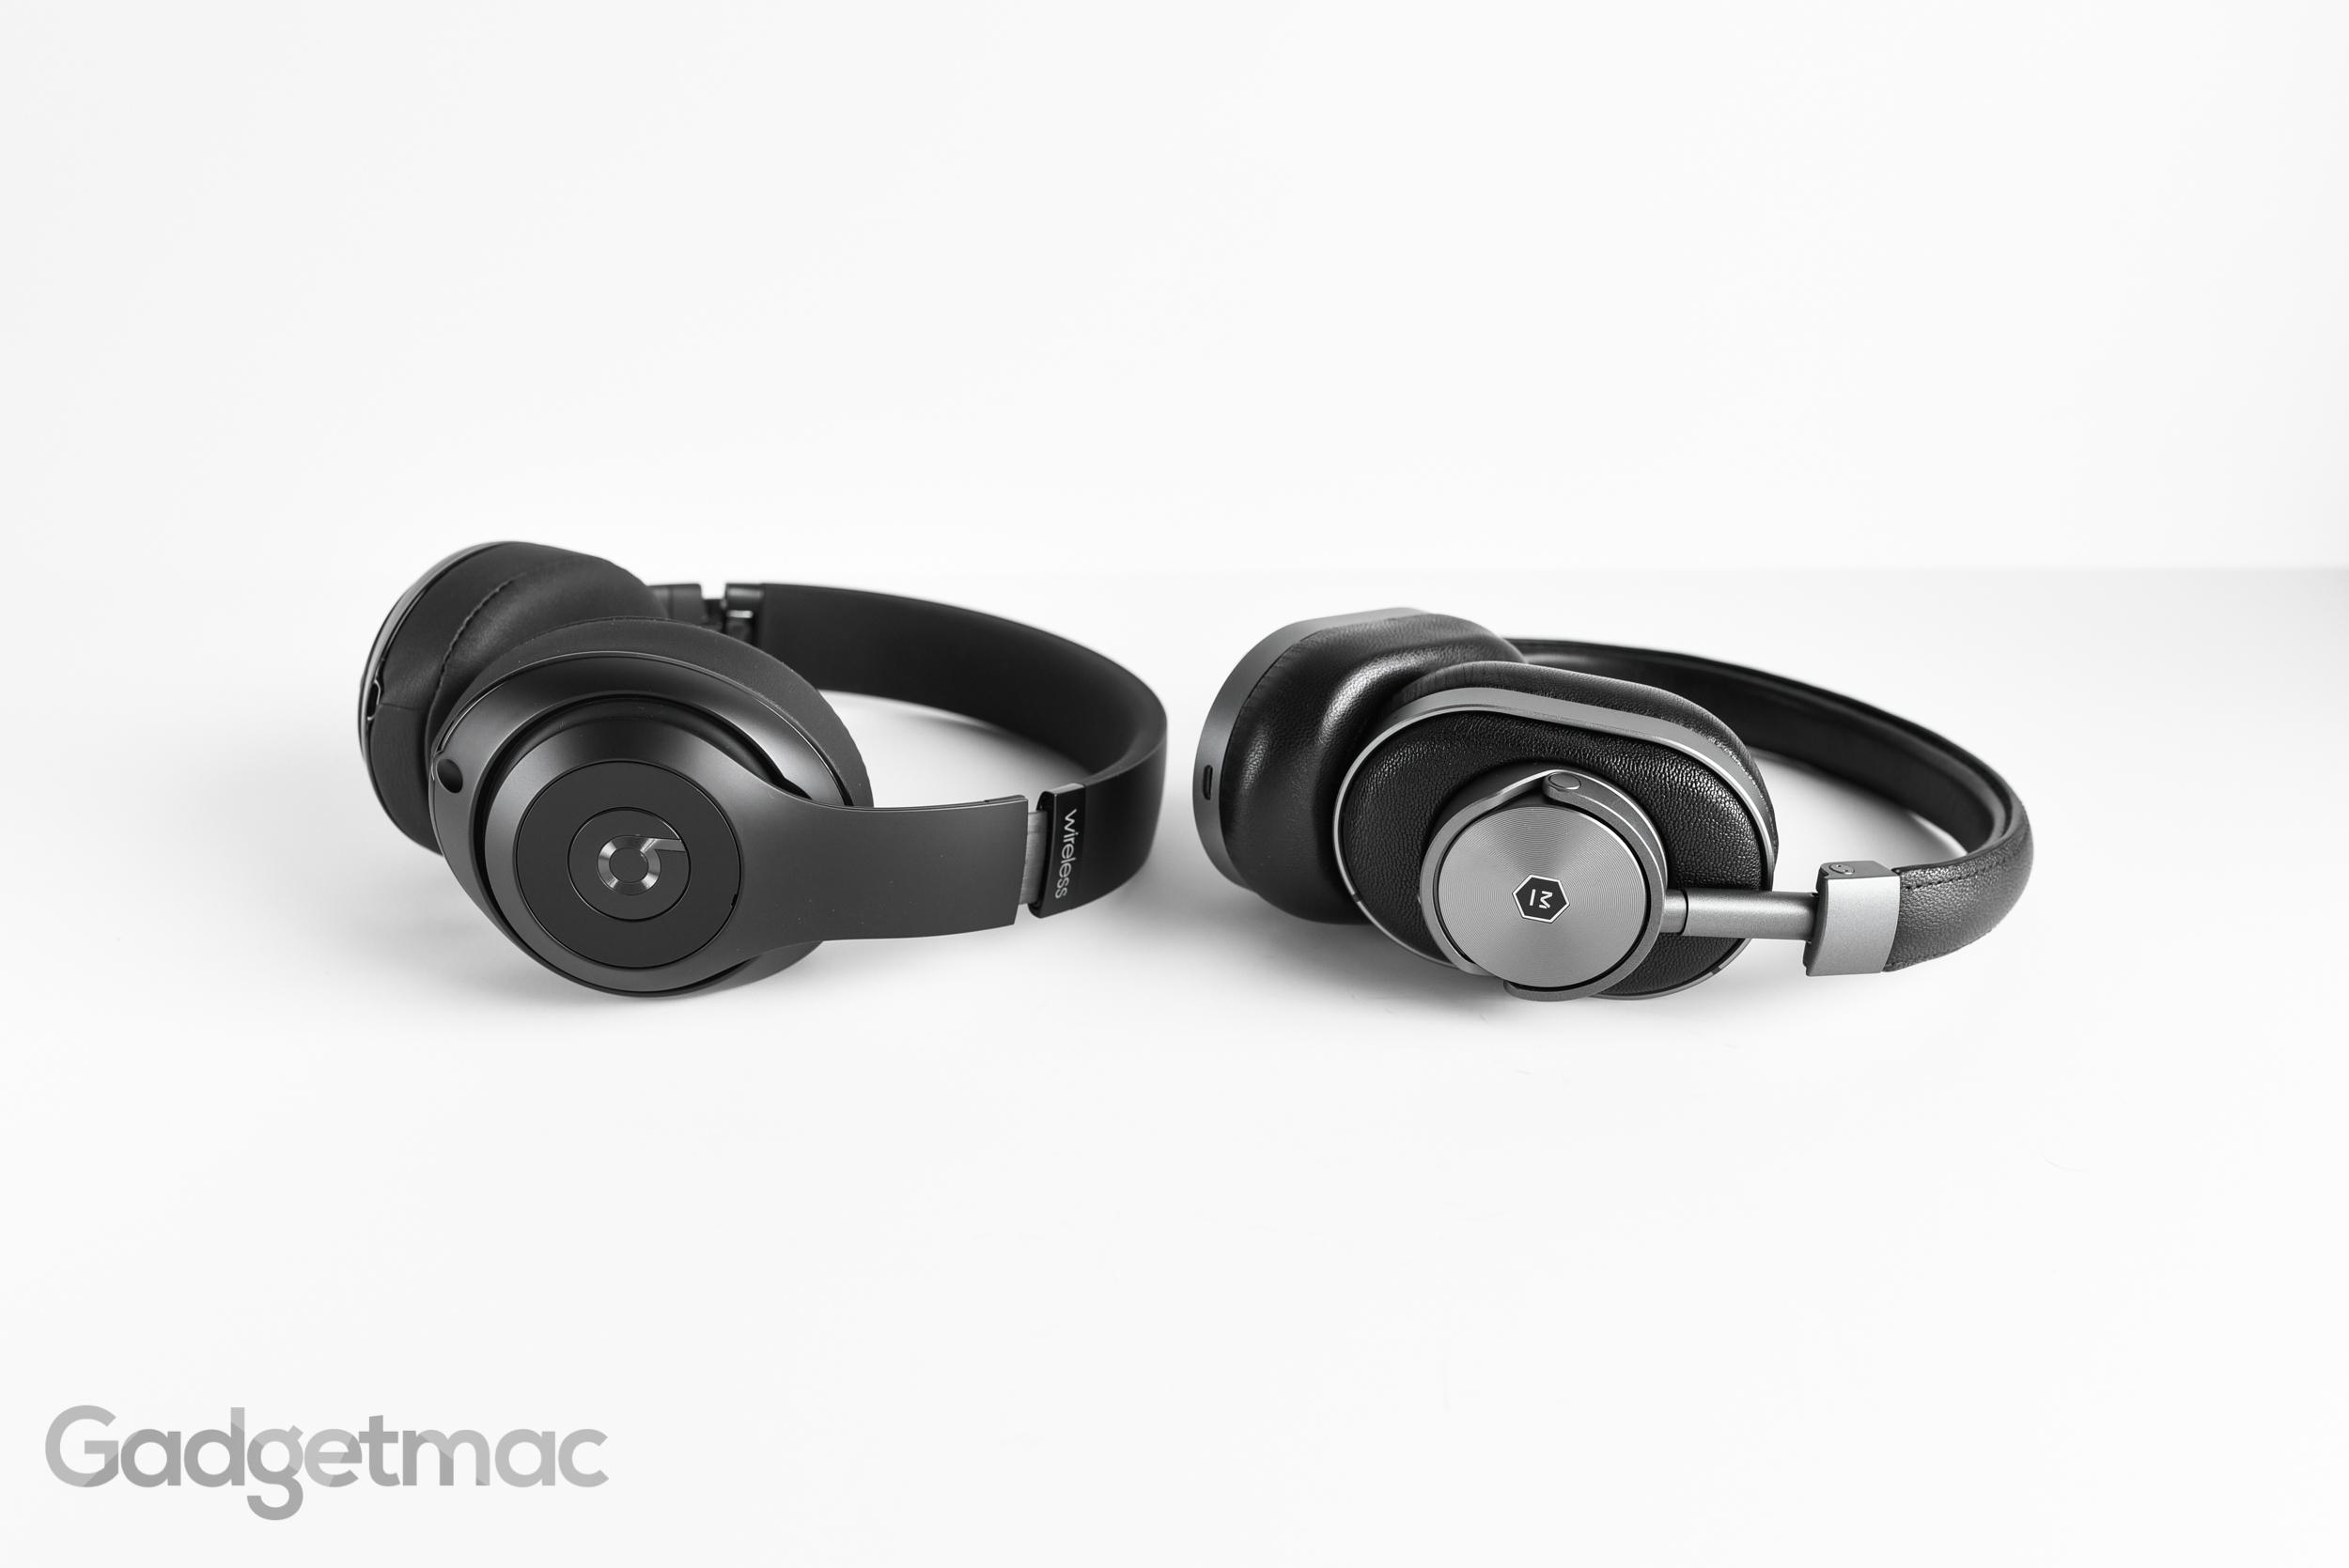 master-dynamic-mw60-vs-beats-studio-wireless-headphones-2.jpg